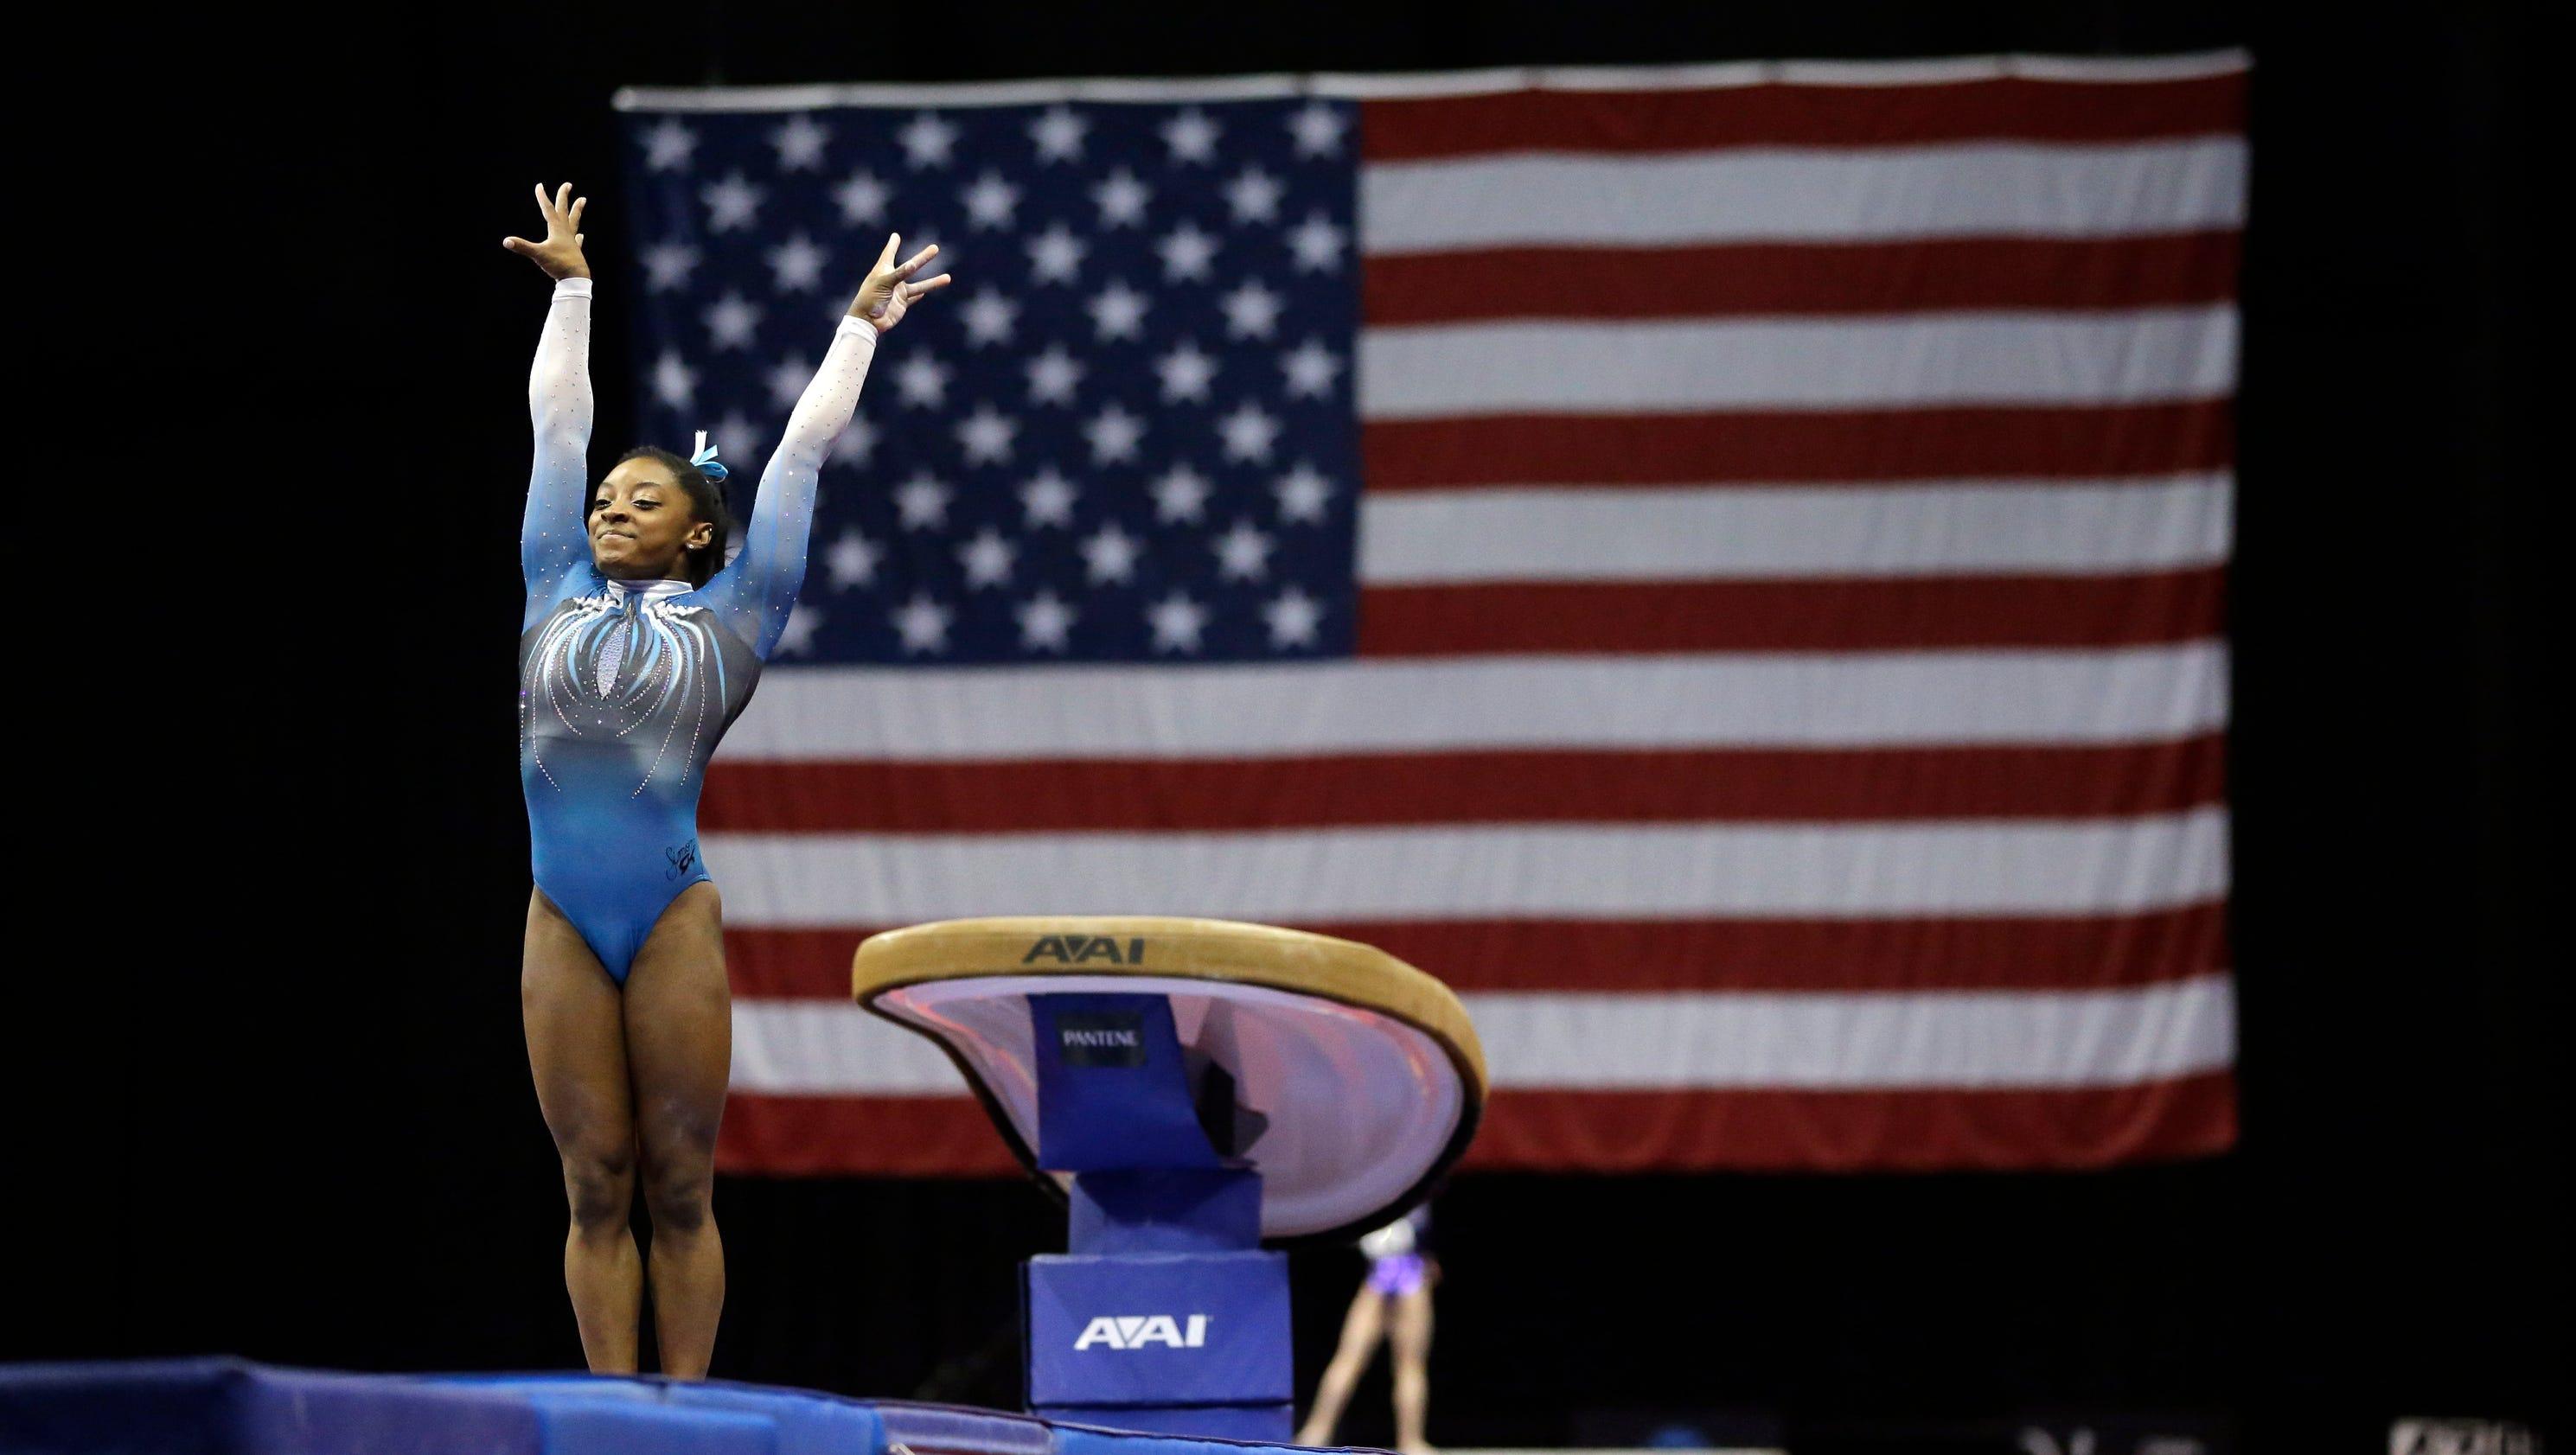 636025803846485167-ap-us-womens-gymnastics-championships-82943250